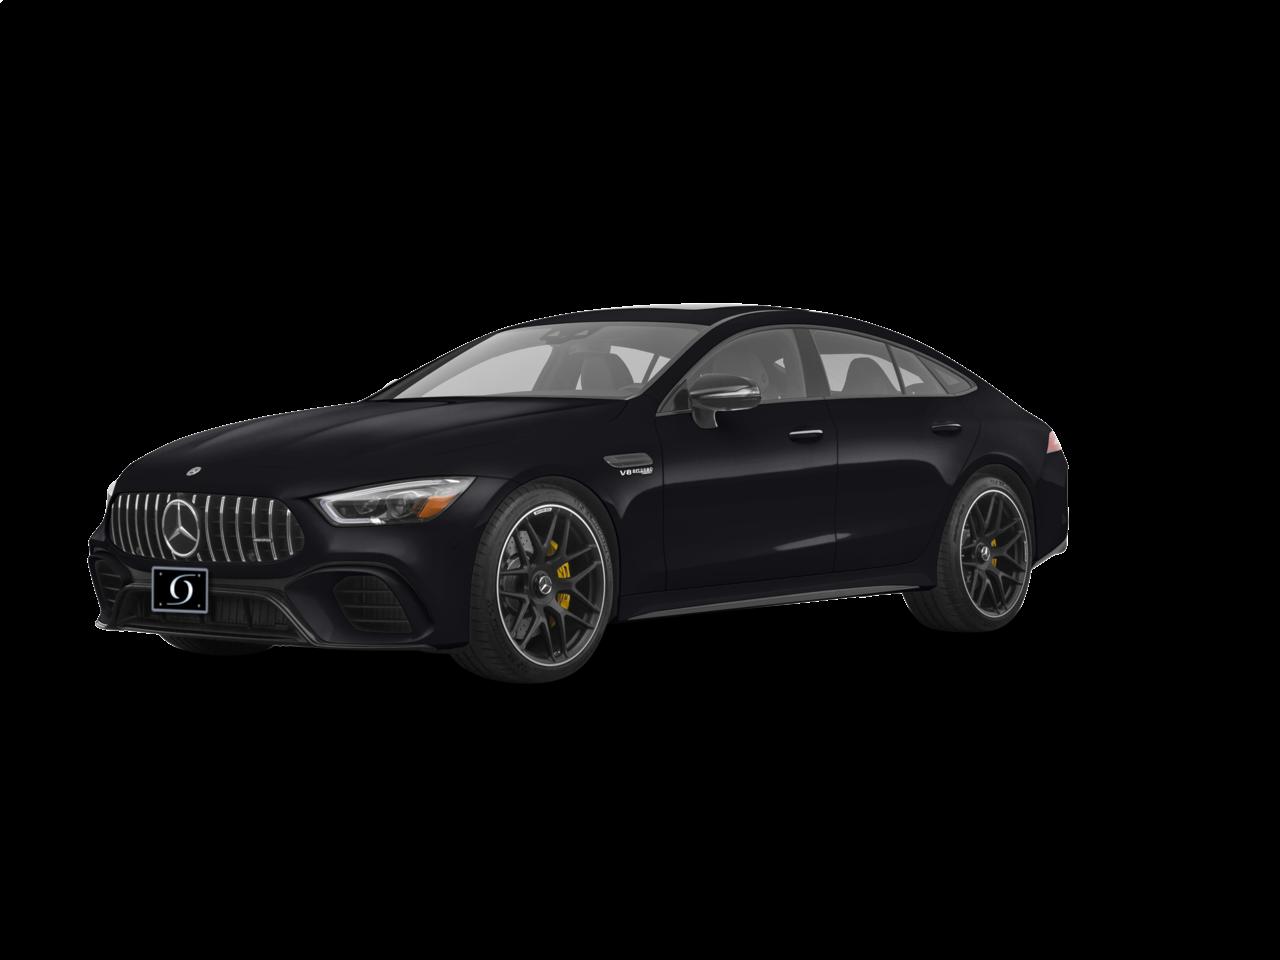 2021 Mercedes AMG GT 63 S 4-Door Coupe Lease Deal